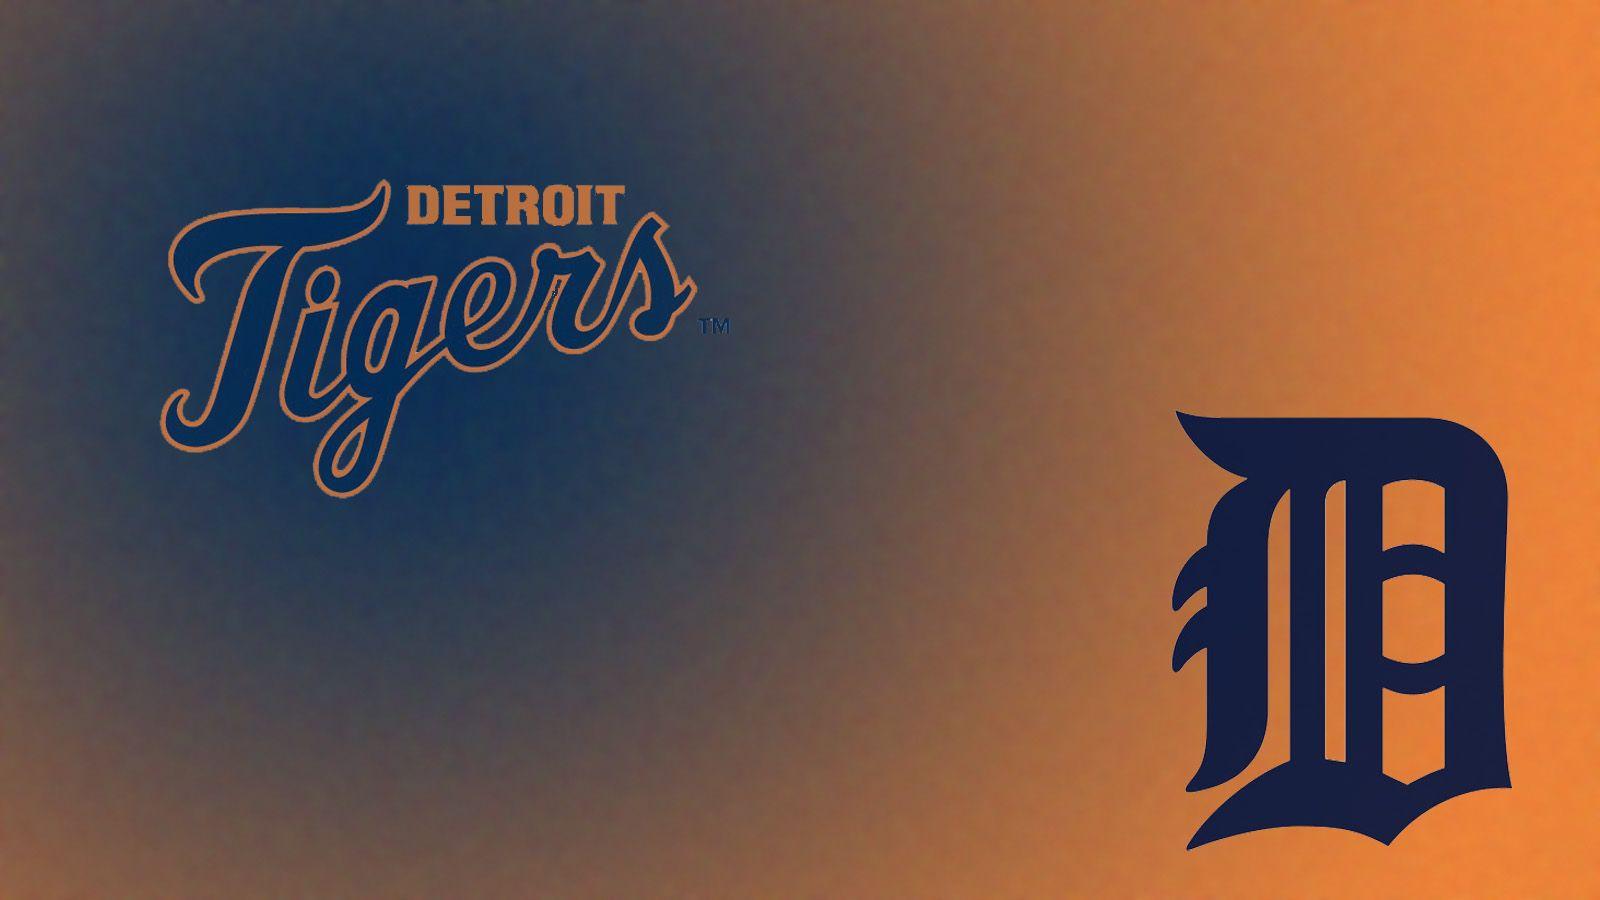 Detroit Tigers Symbols Background Jpg 1600 900 Detroit Tigers Detroit Wallpaper Size